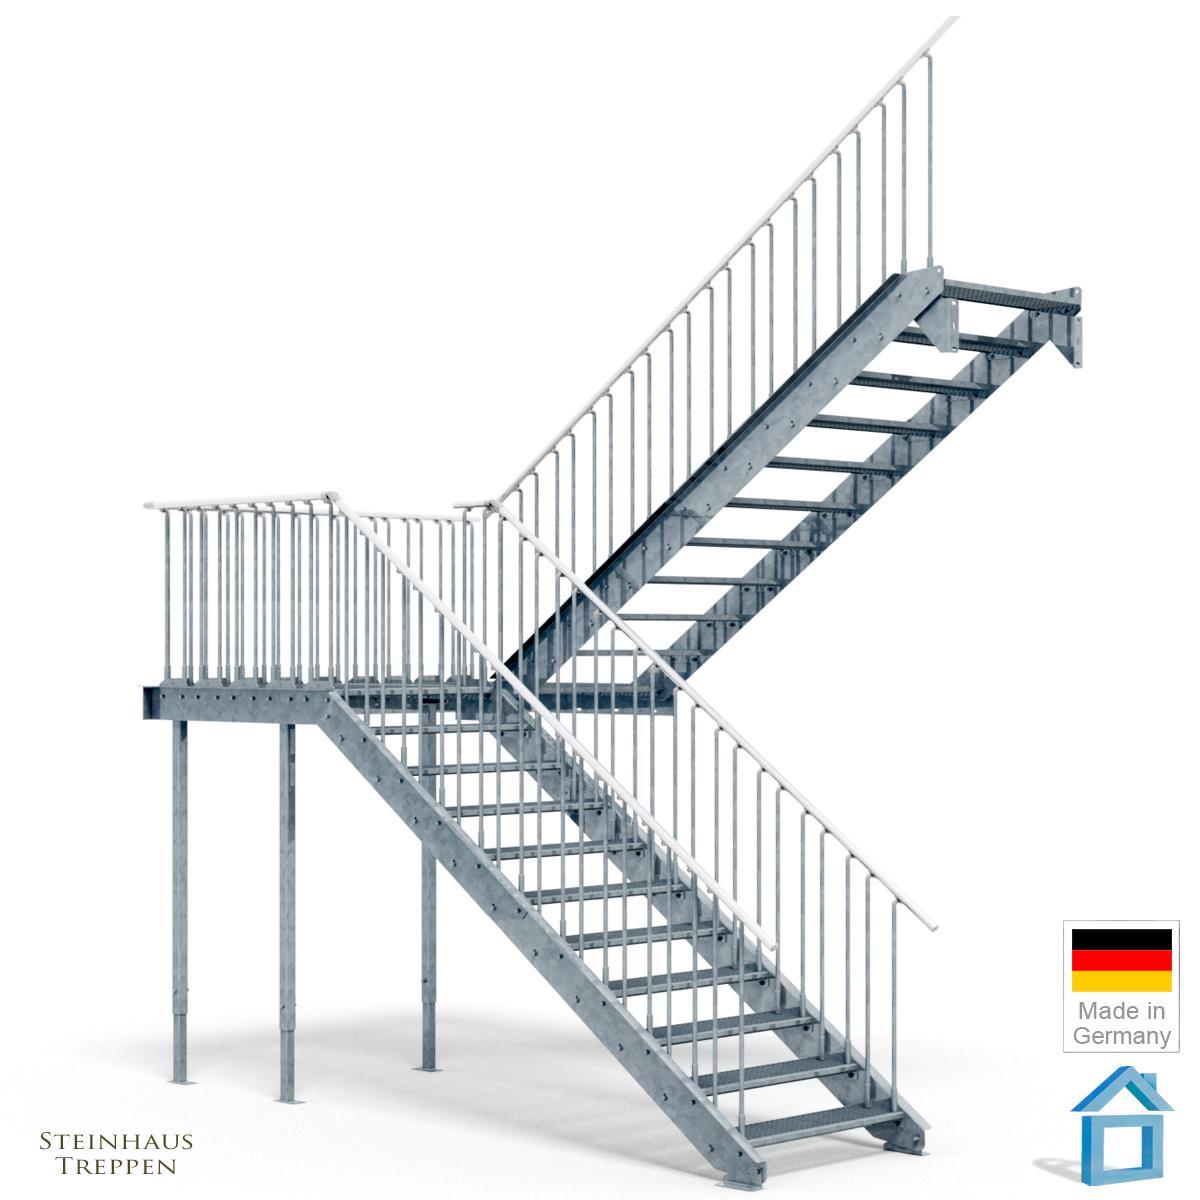 steinhaus treppen fahrstuhlwartung treppenbau treppenwartung in l beck sch nb ken. Black Bedroom Furniture Sets. Home Design Ideas